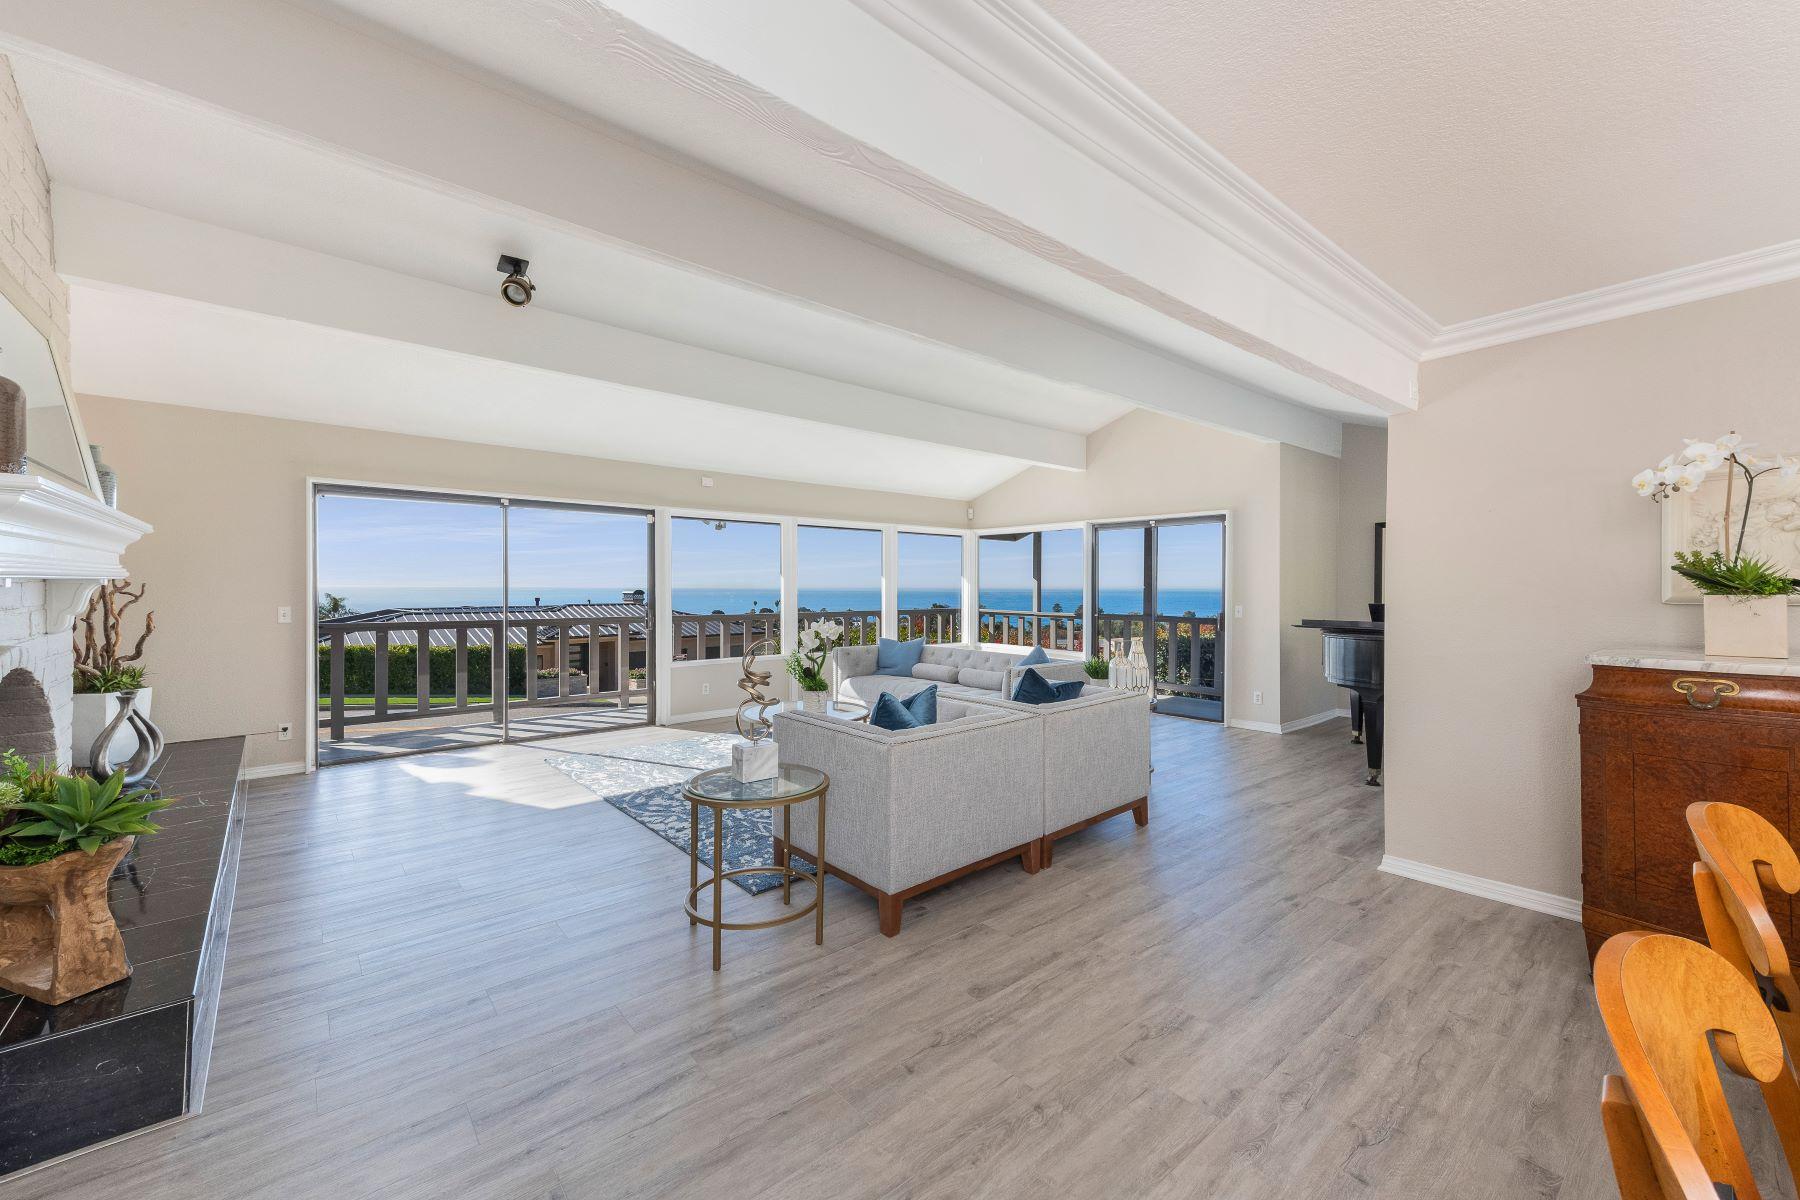 Single Family Homes for Sale at MONARCH BAY TERRACE - SEVEN SEAS 32401 Seven Seas Dr. Dana Point, California 92629 United States